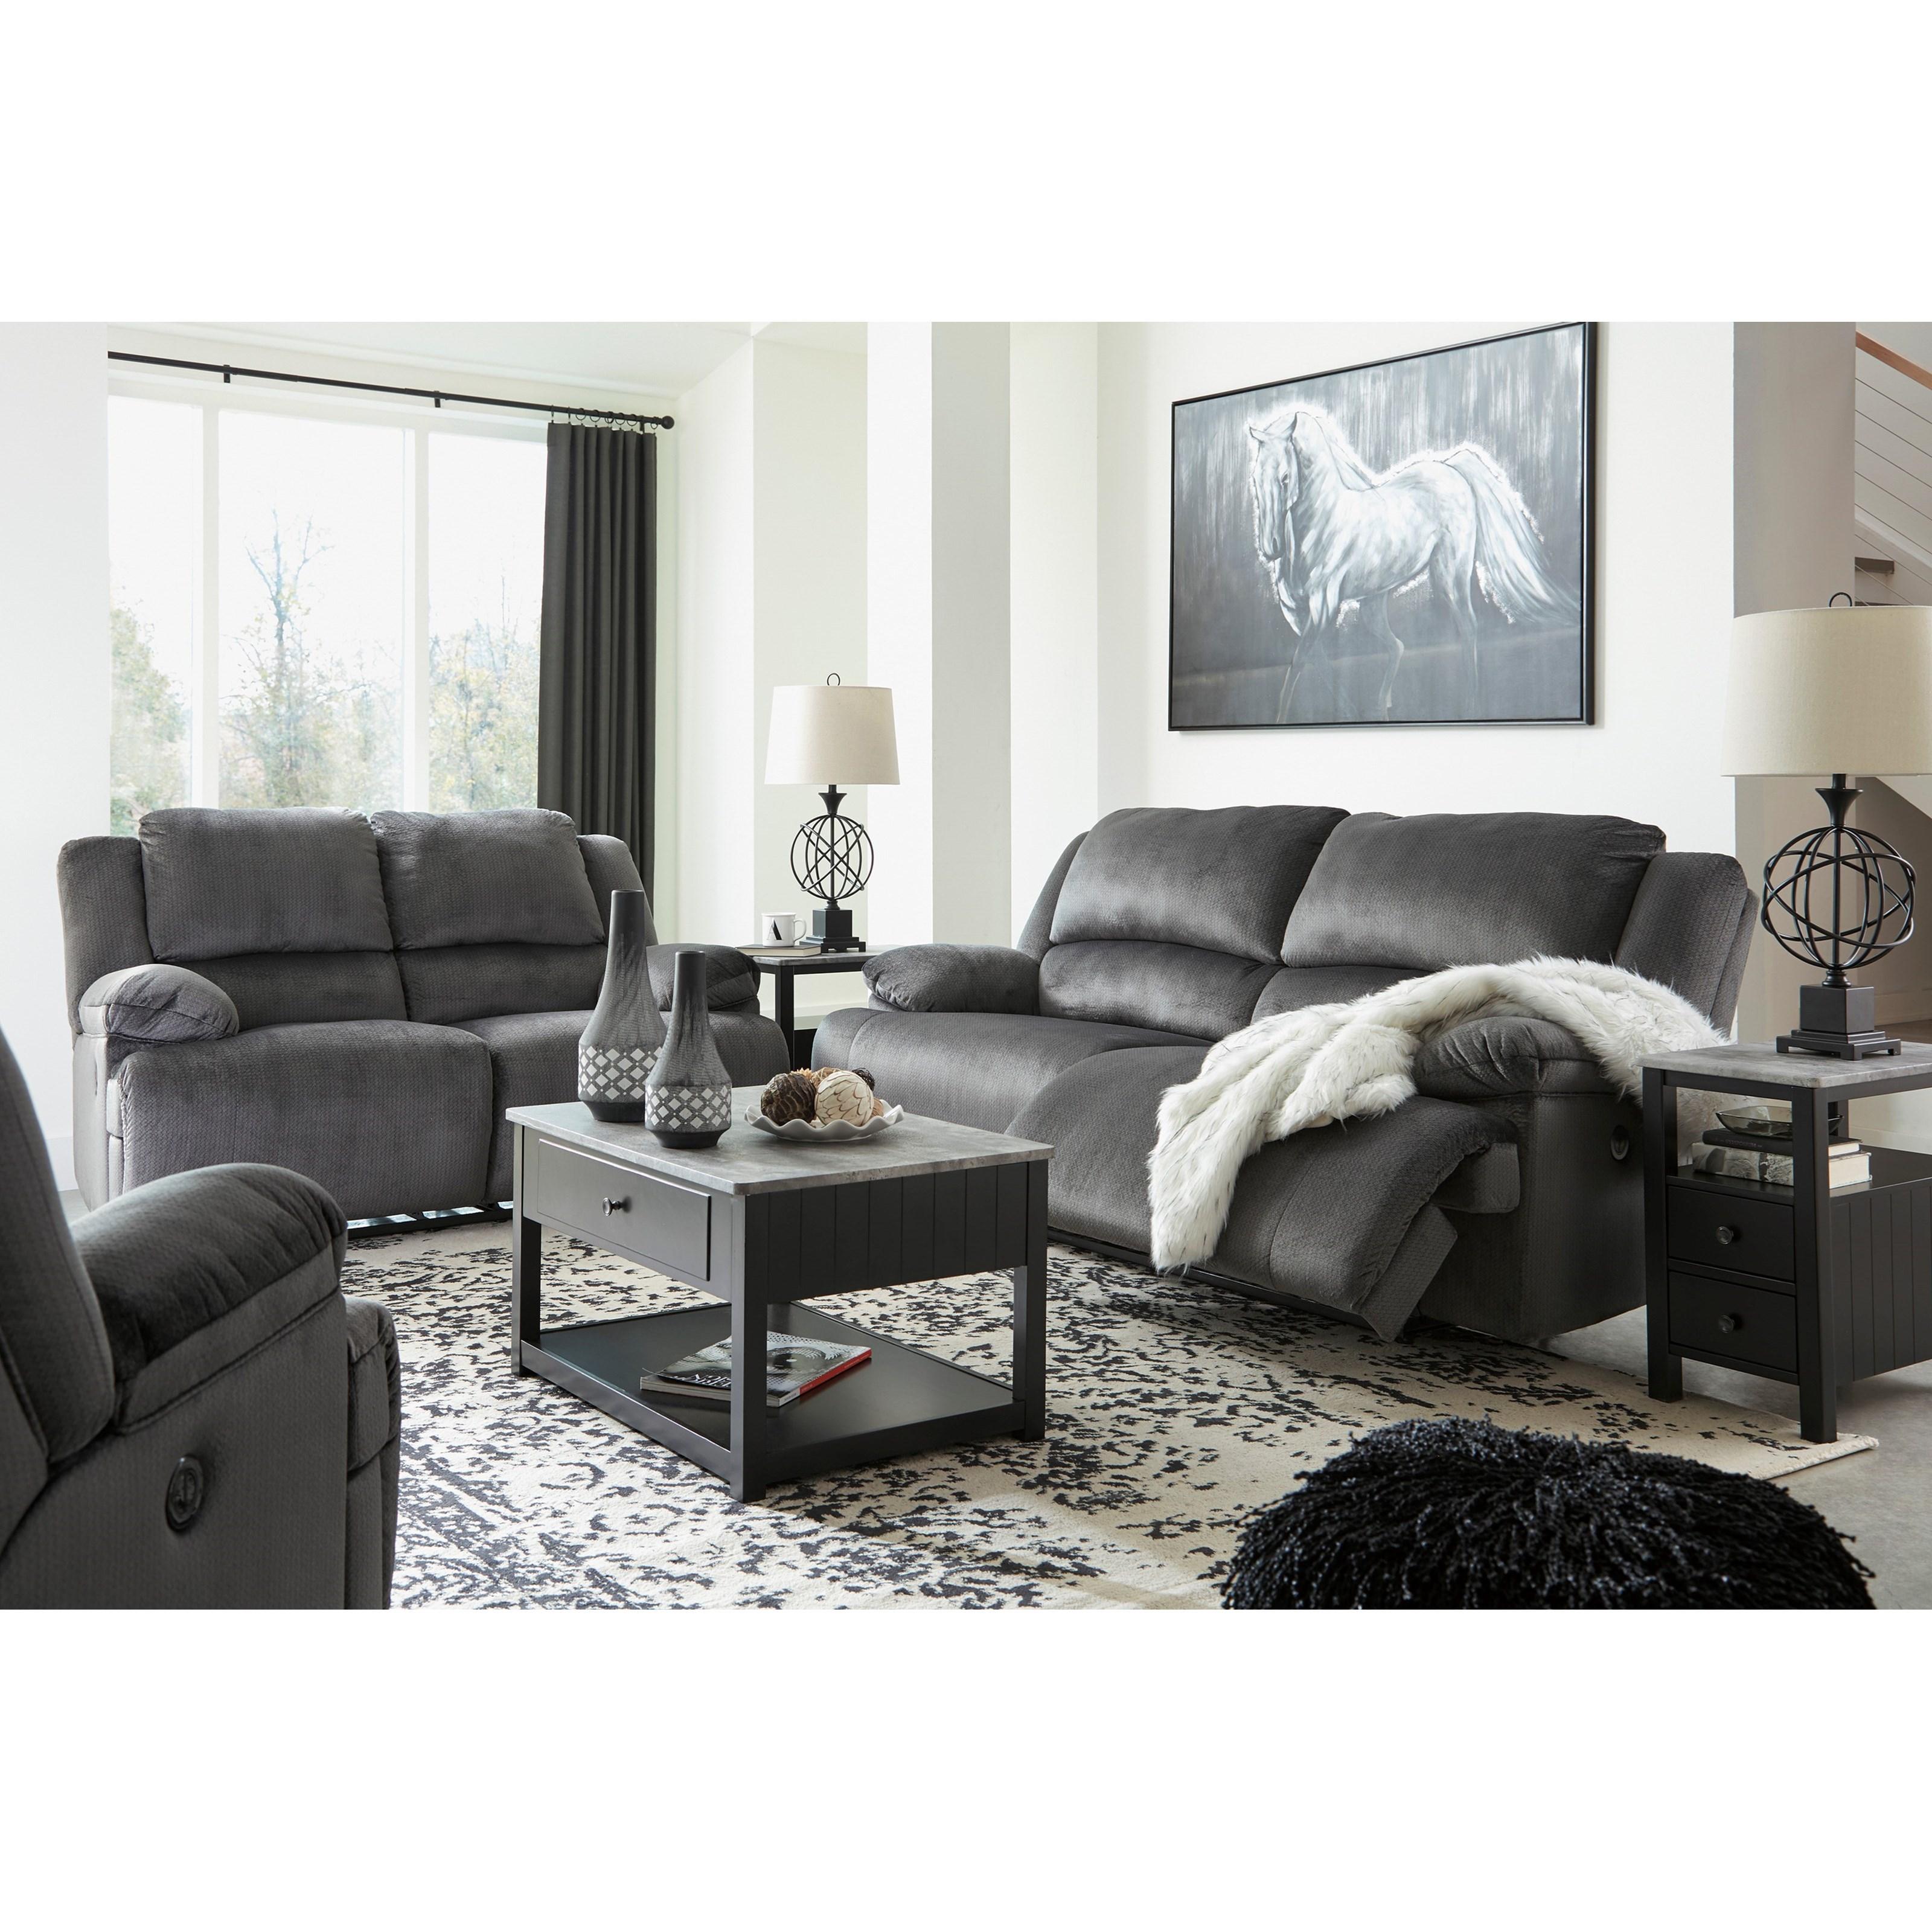 Ashley (Signature Design) Clonmel Reclining Living Room